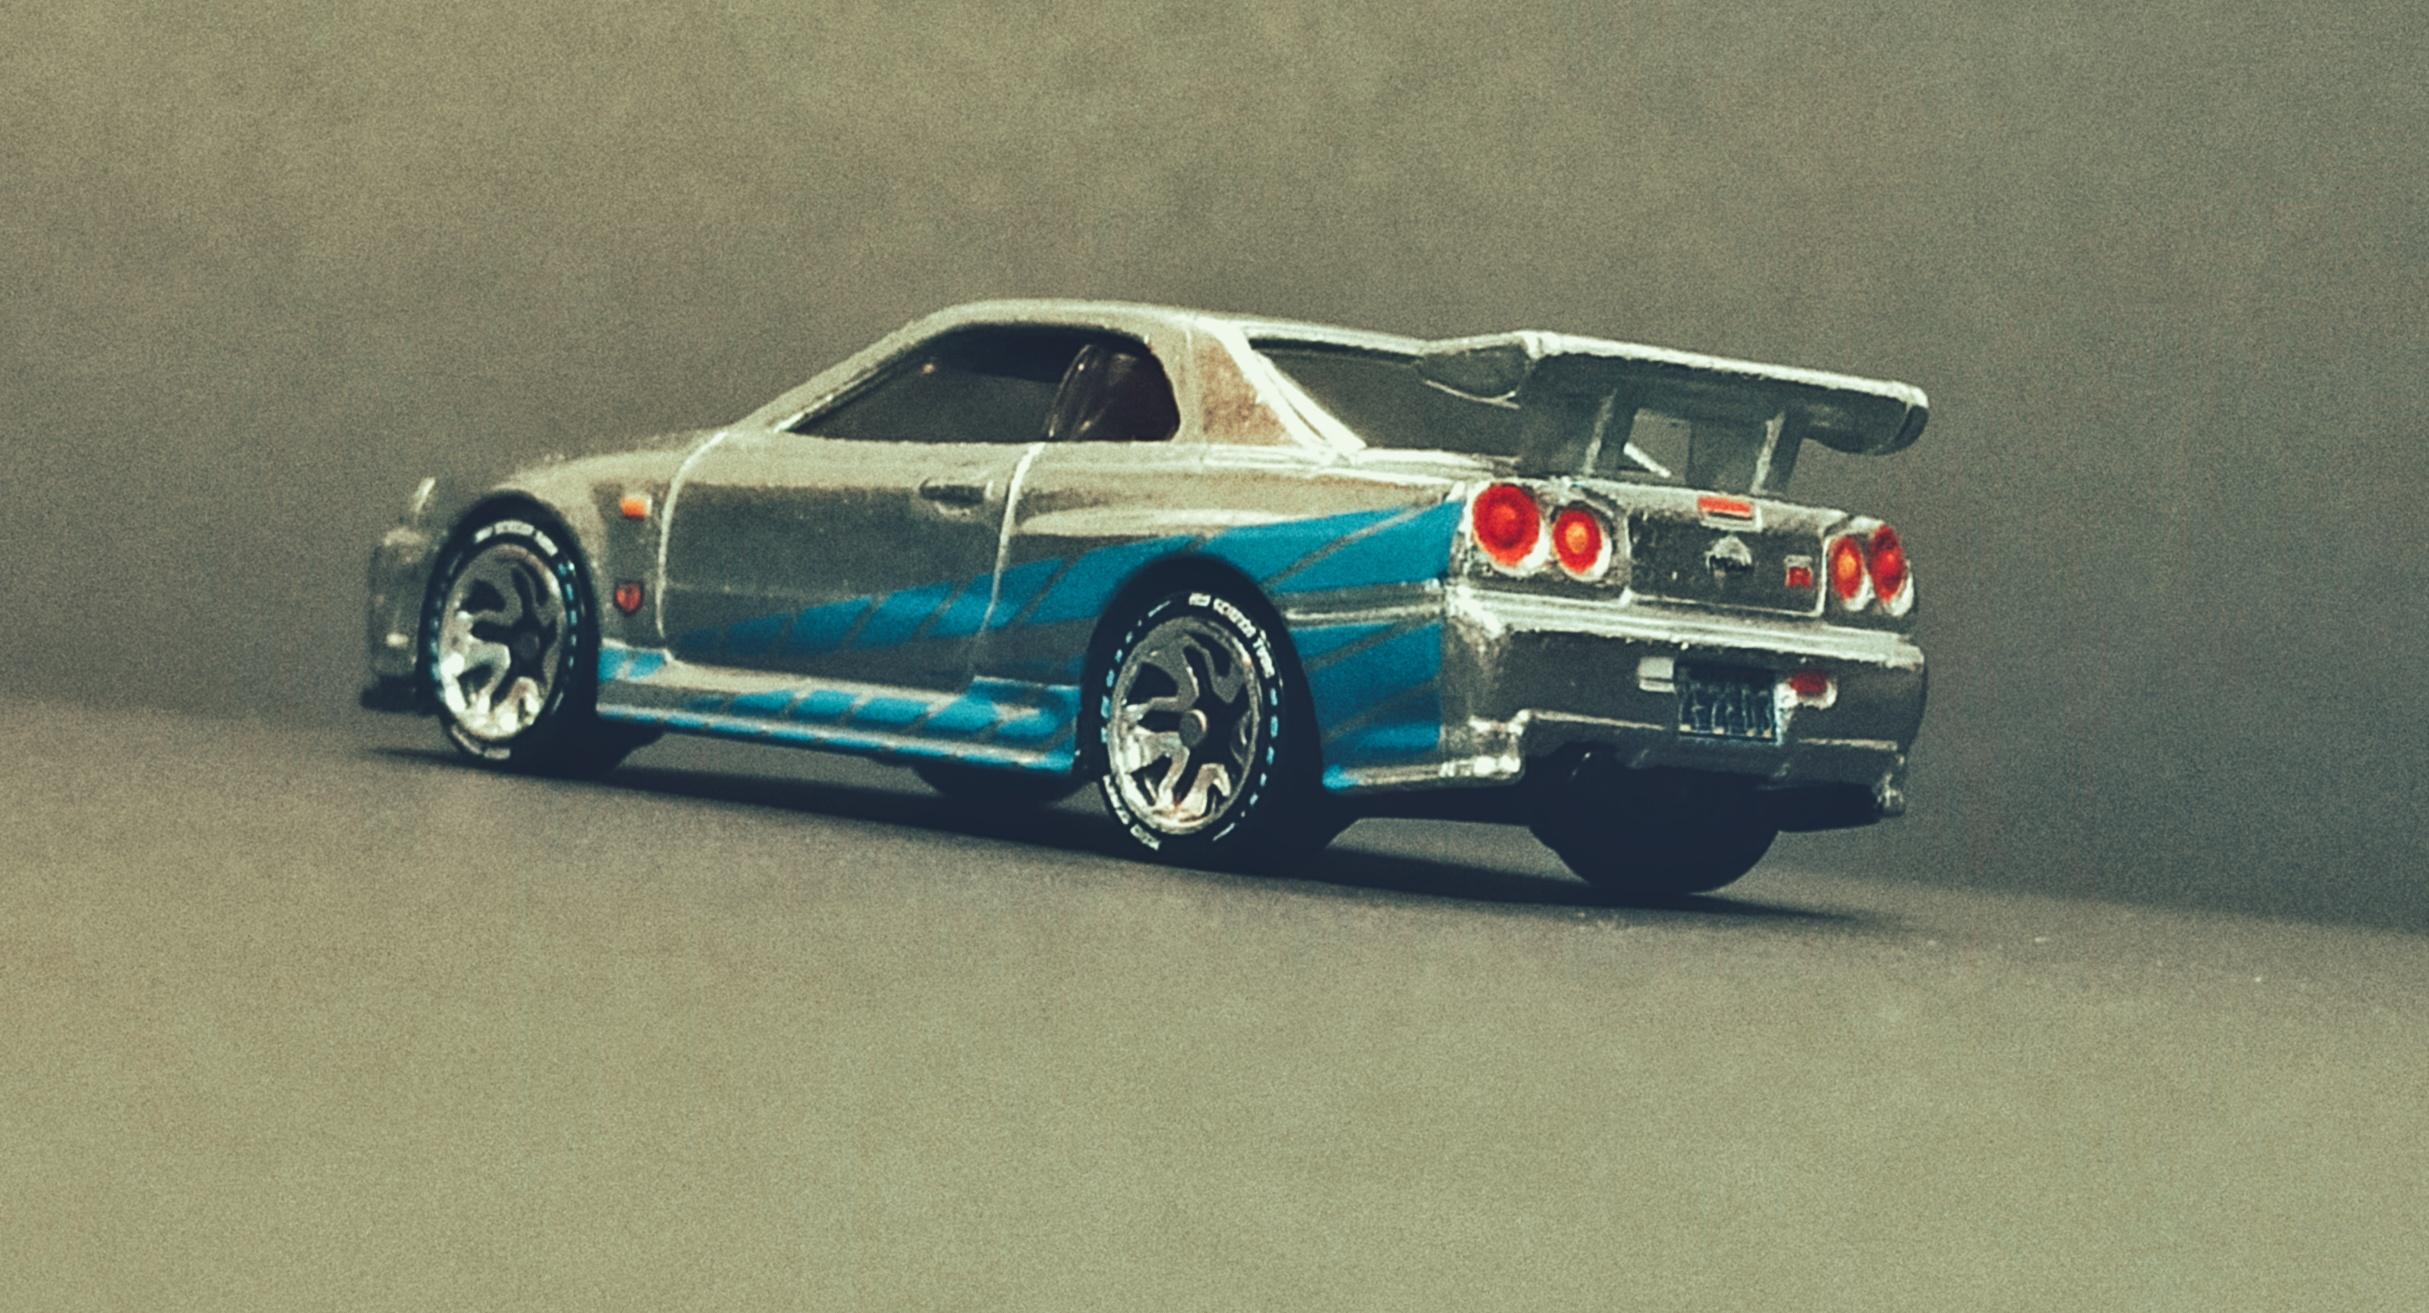 Hot Wheels id Nissan Skyline GT-R (R34) (HCJ08) 2021 HW Screen Time (01/03) zamac side angle